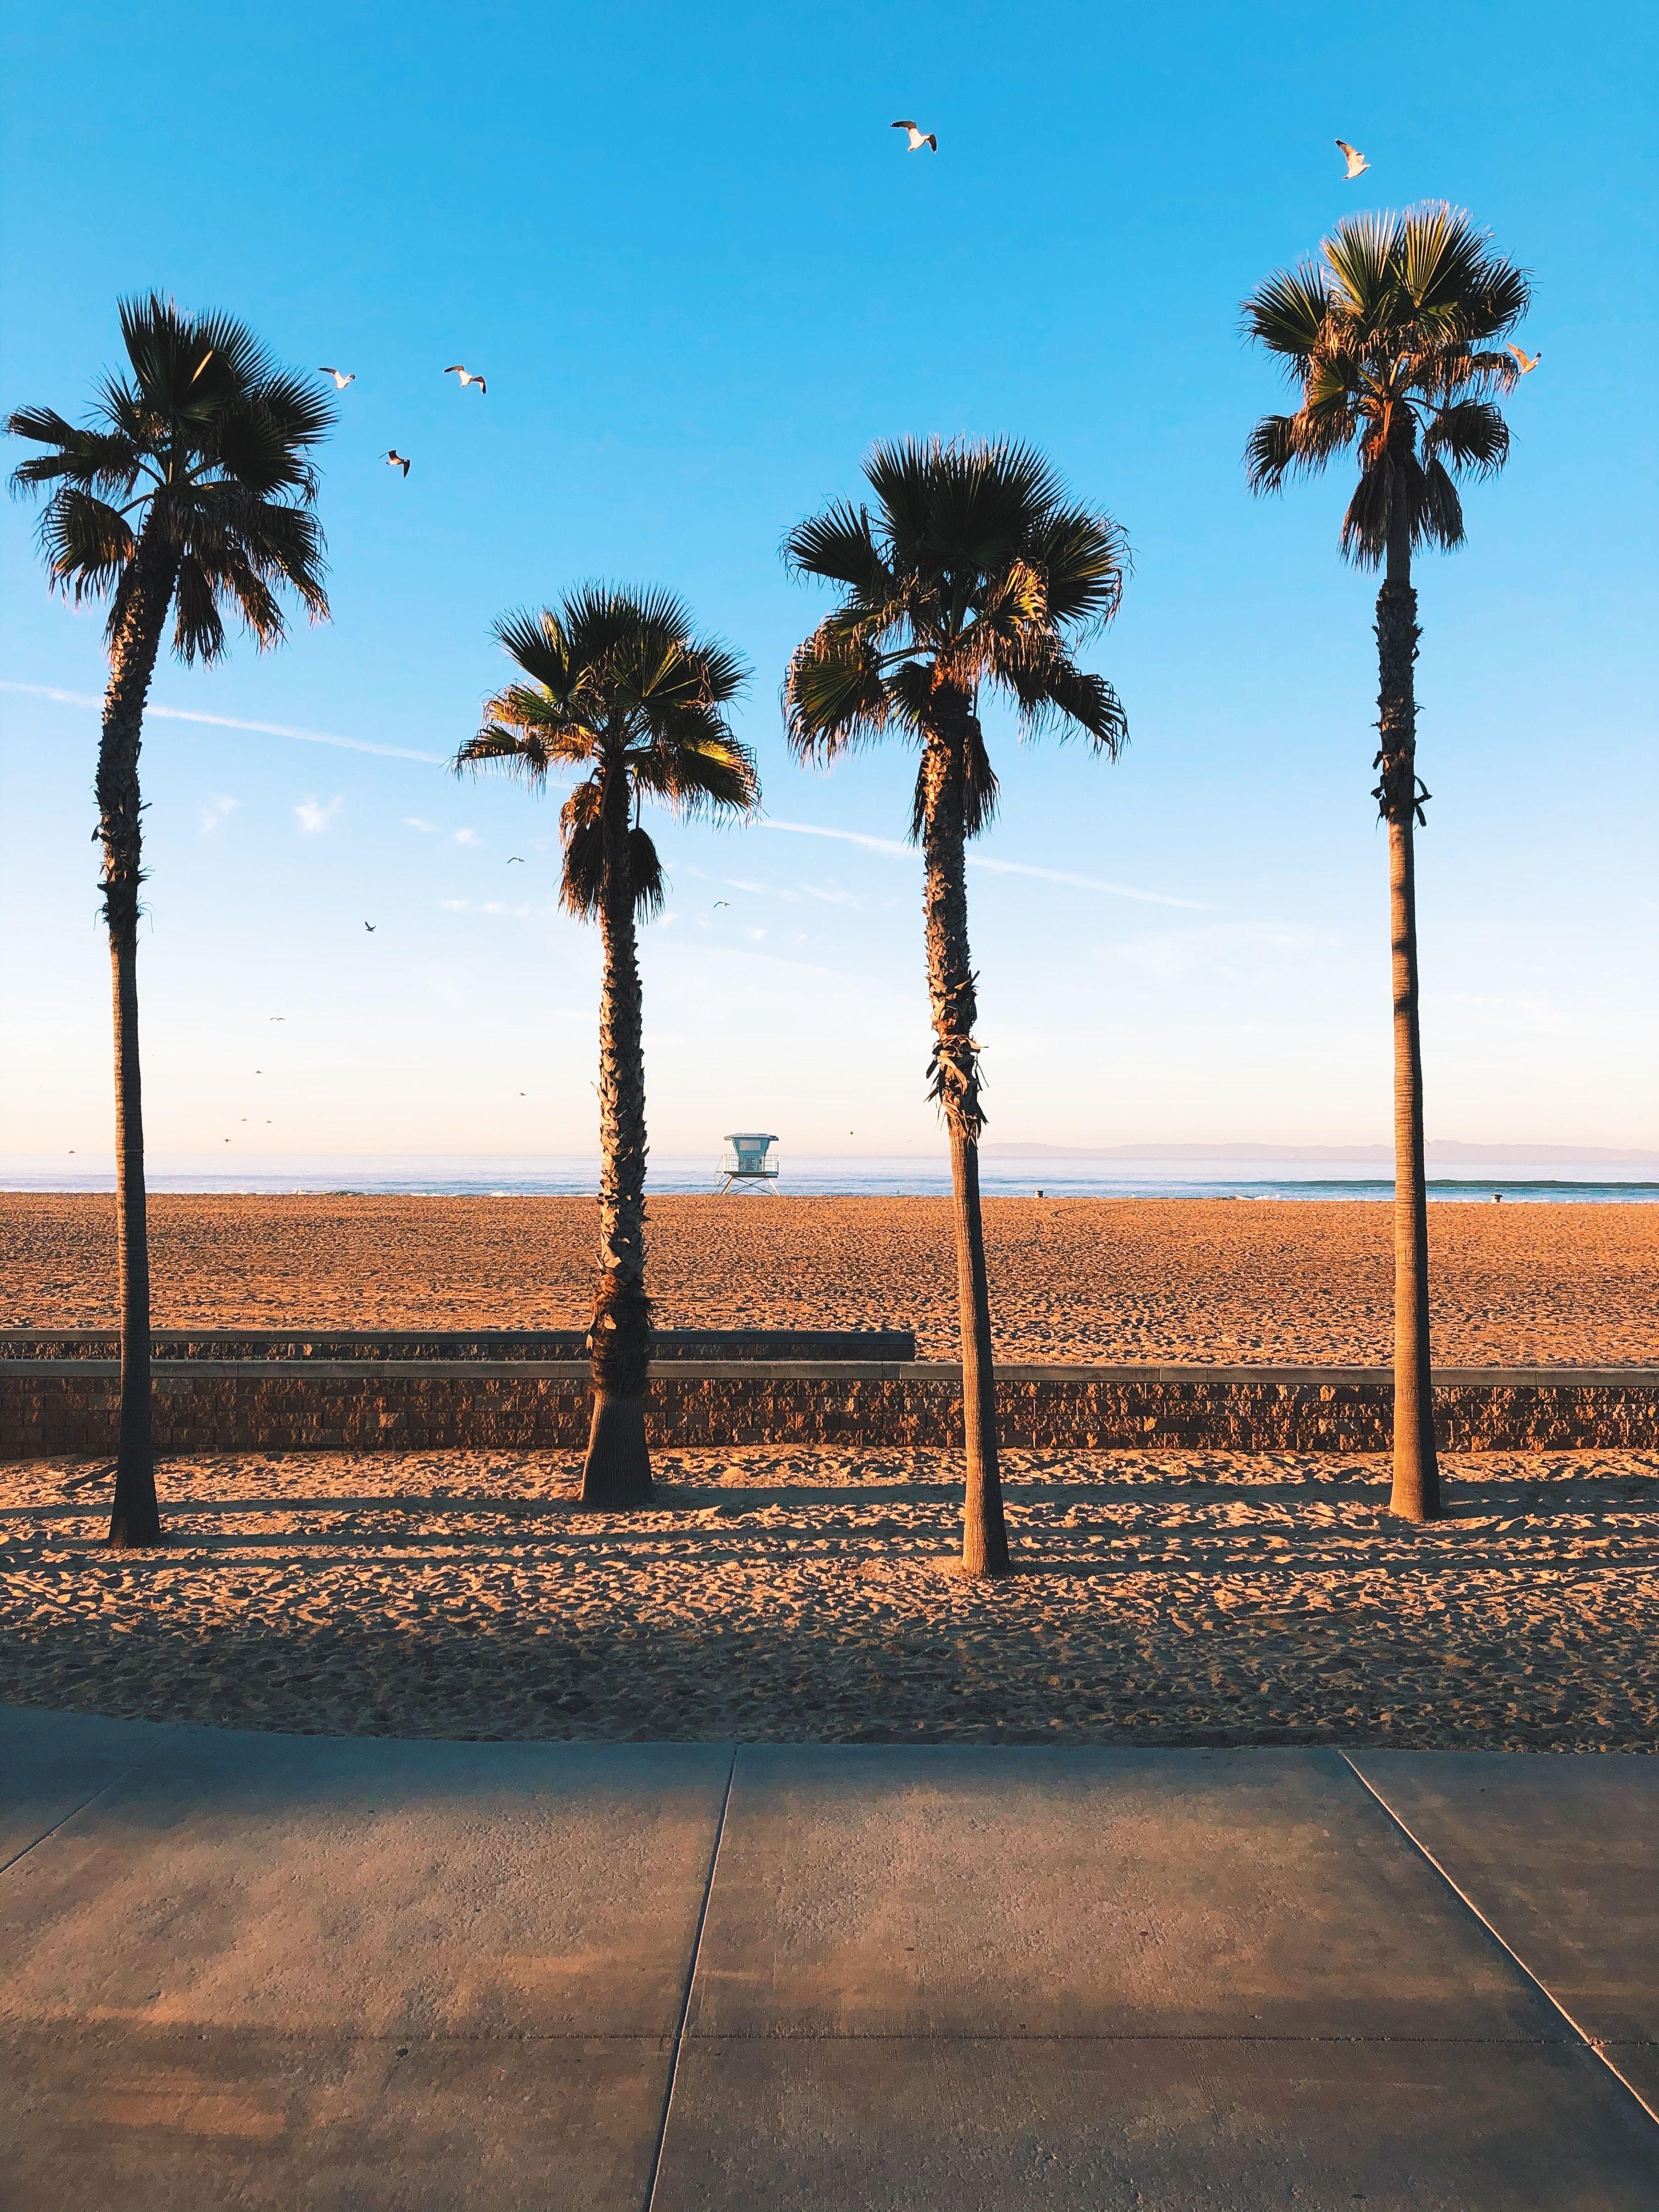 Huntington Beach, CA in 2020 | Huntington beach hotels, Huntington